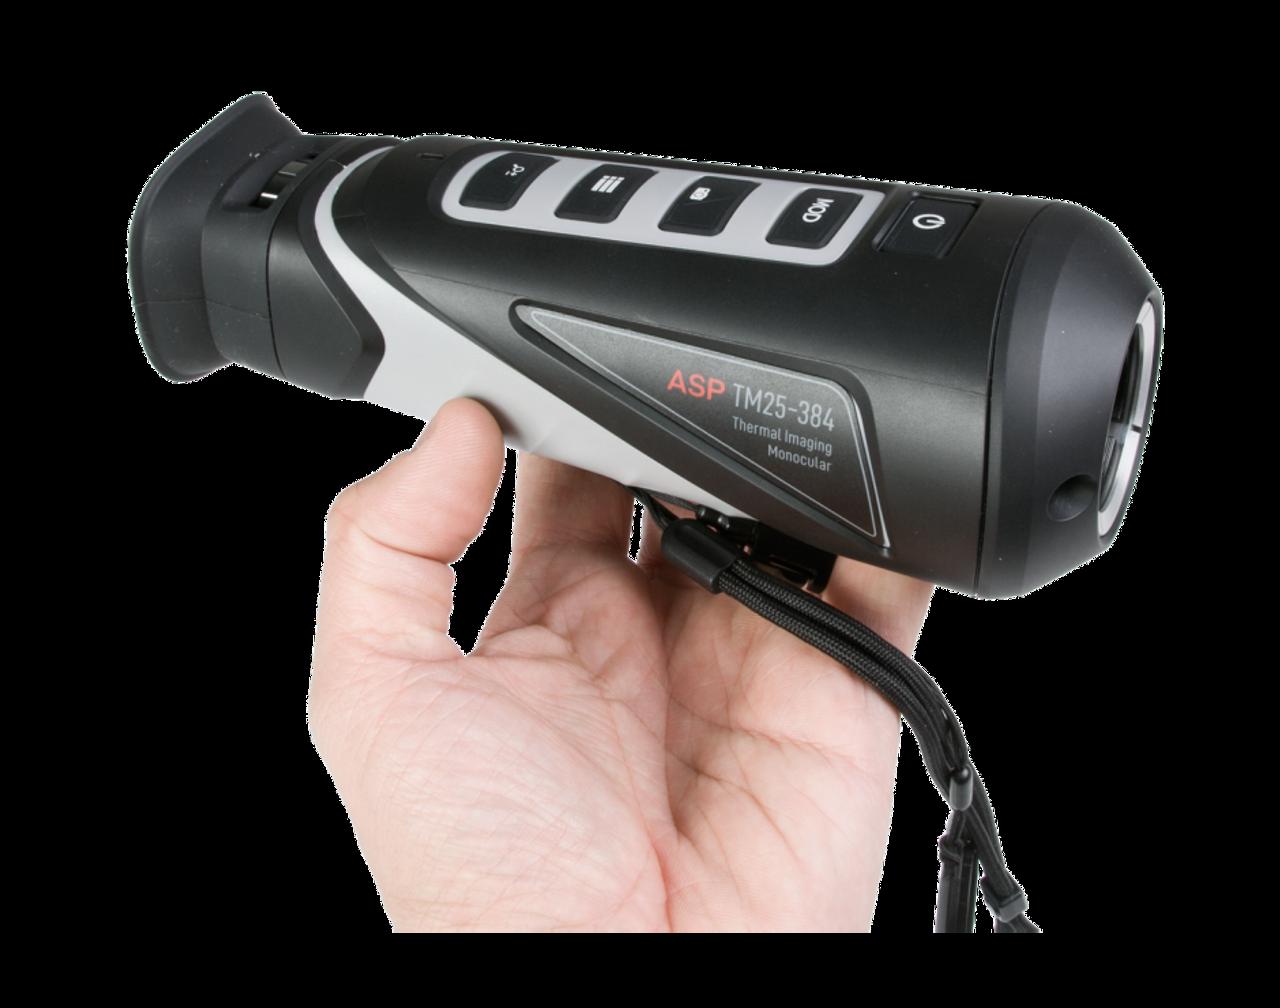 AGM Asp TM35-384 Medium Range Thermal Imaging Monocular 384x288 (50 Hz), 35 mm lens. (AGM Asp TM35-384)